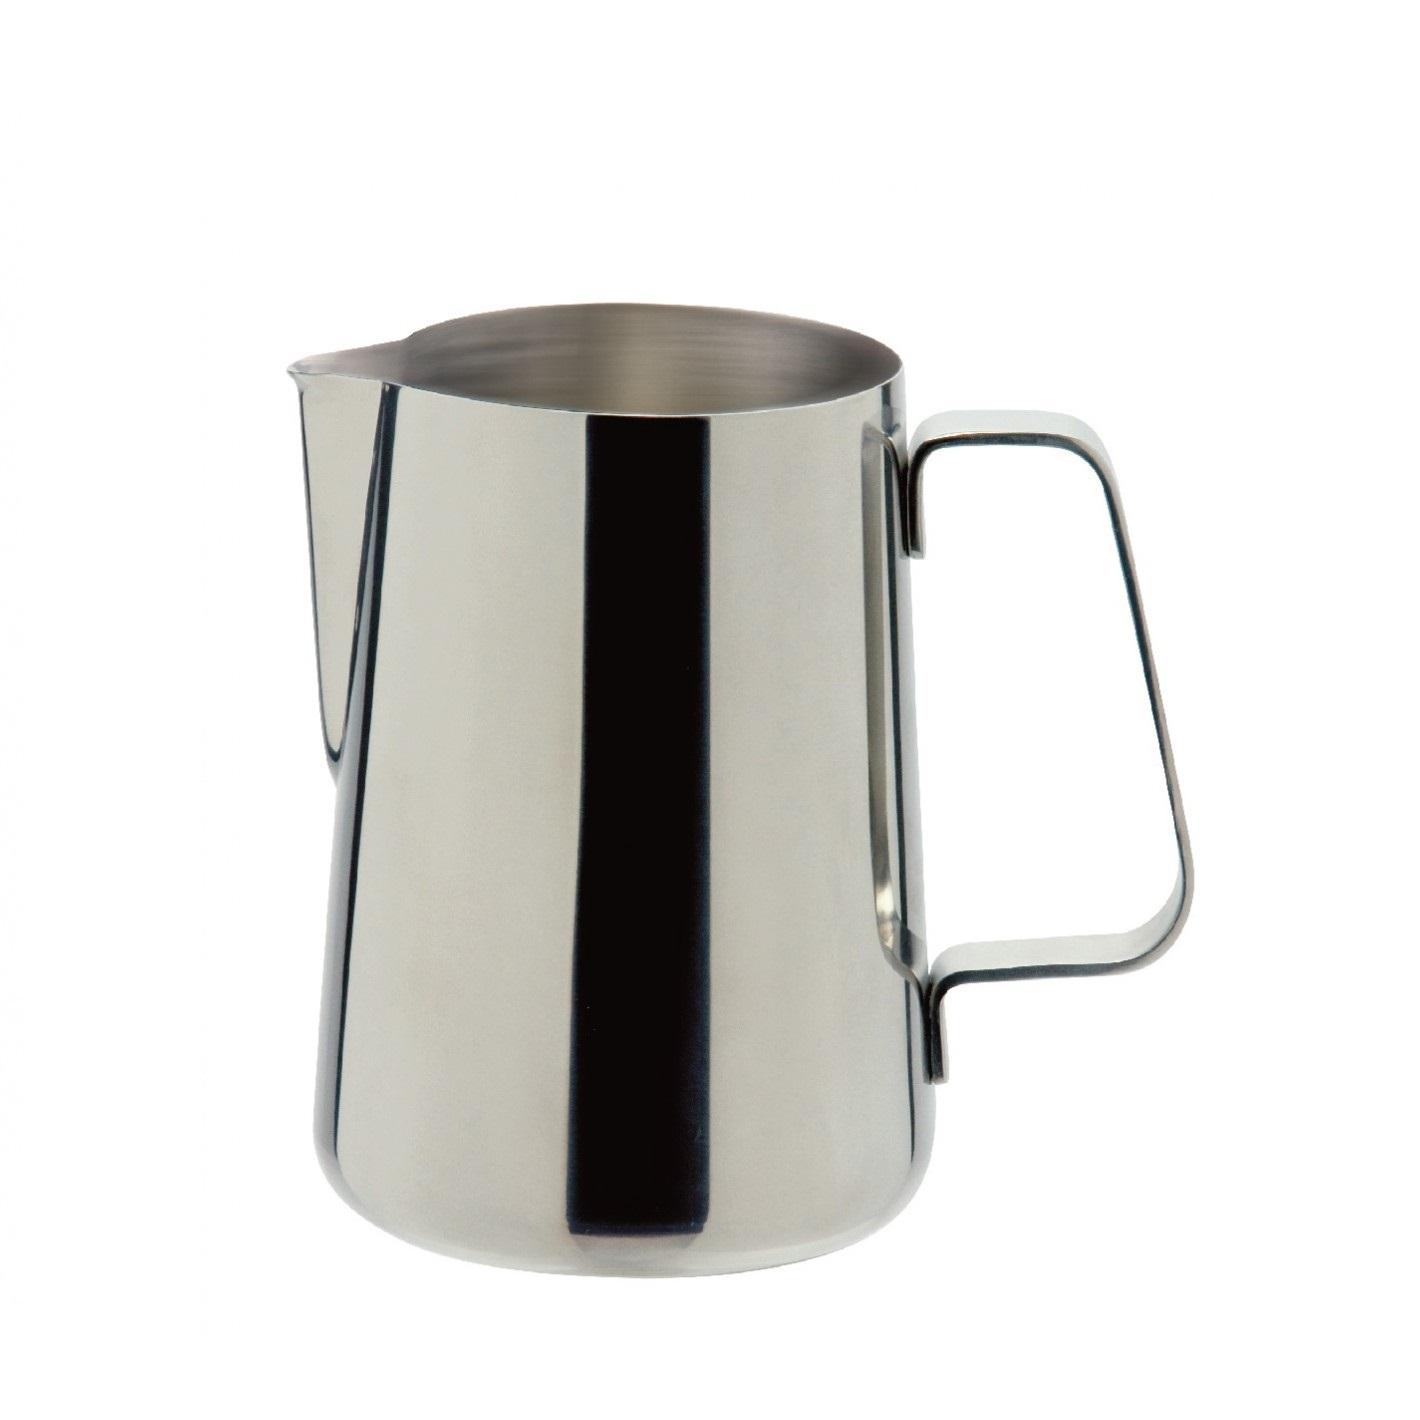 Lattiera Easy din inox pentru cappuccino 300ml 620250